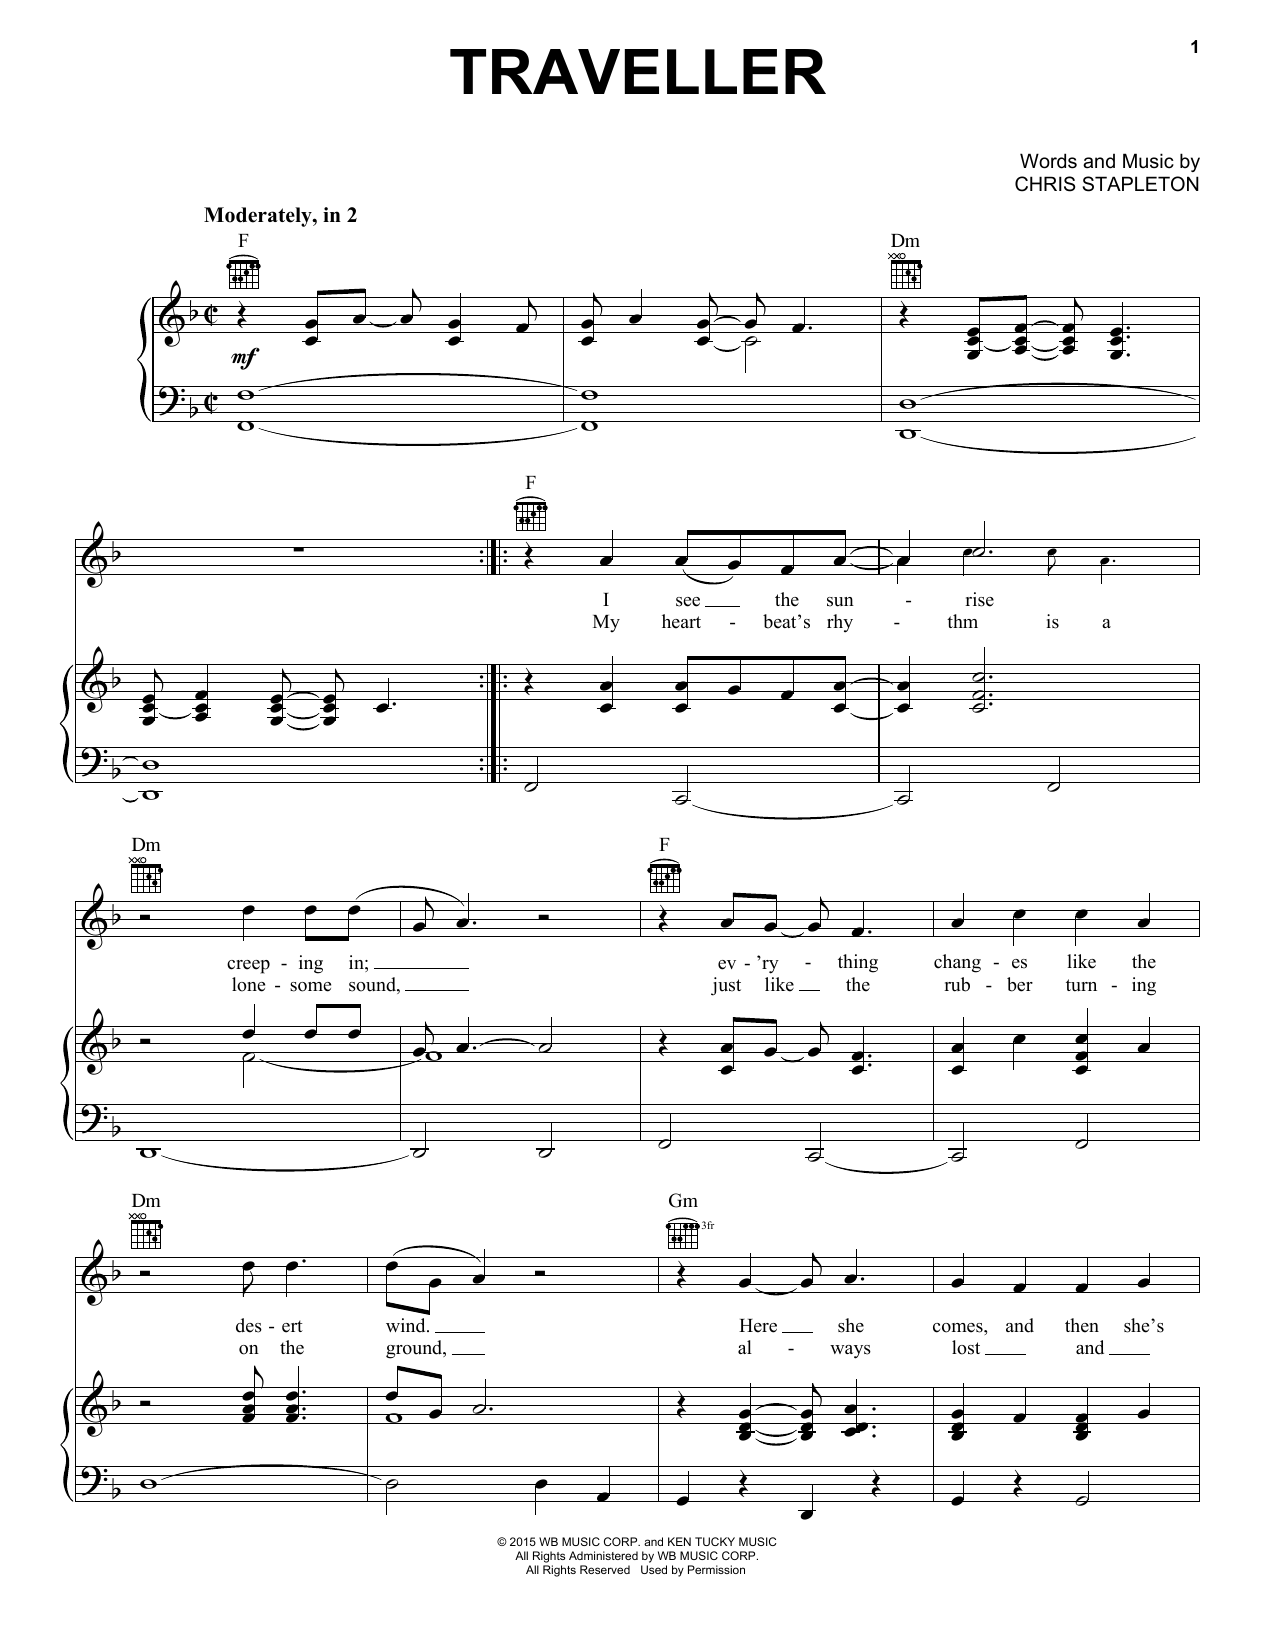 Chris Stapleton Traveller sheet music notes and chords. Download Printable PDF.